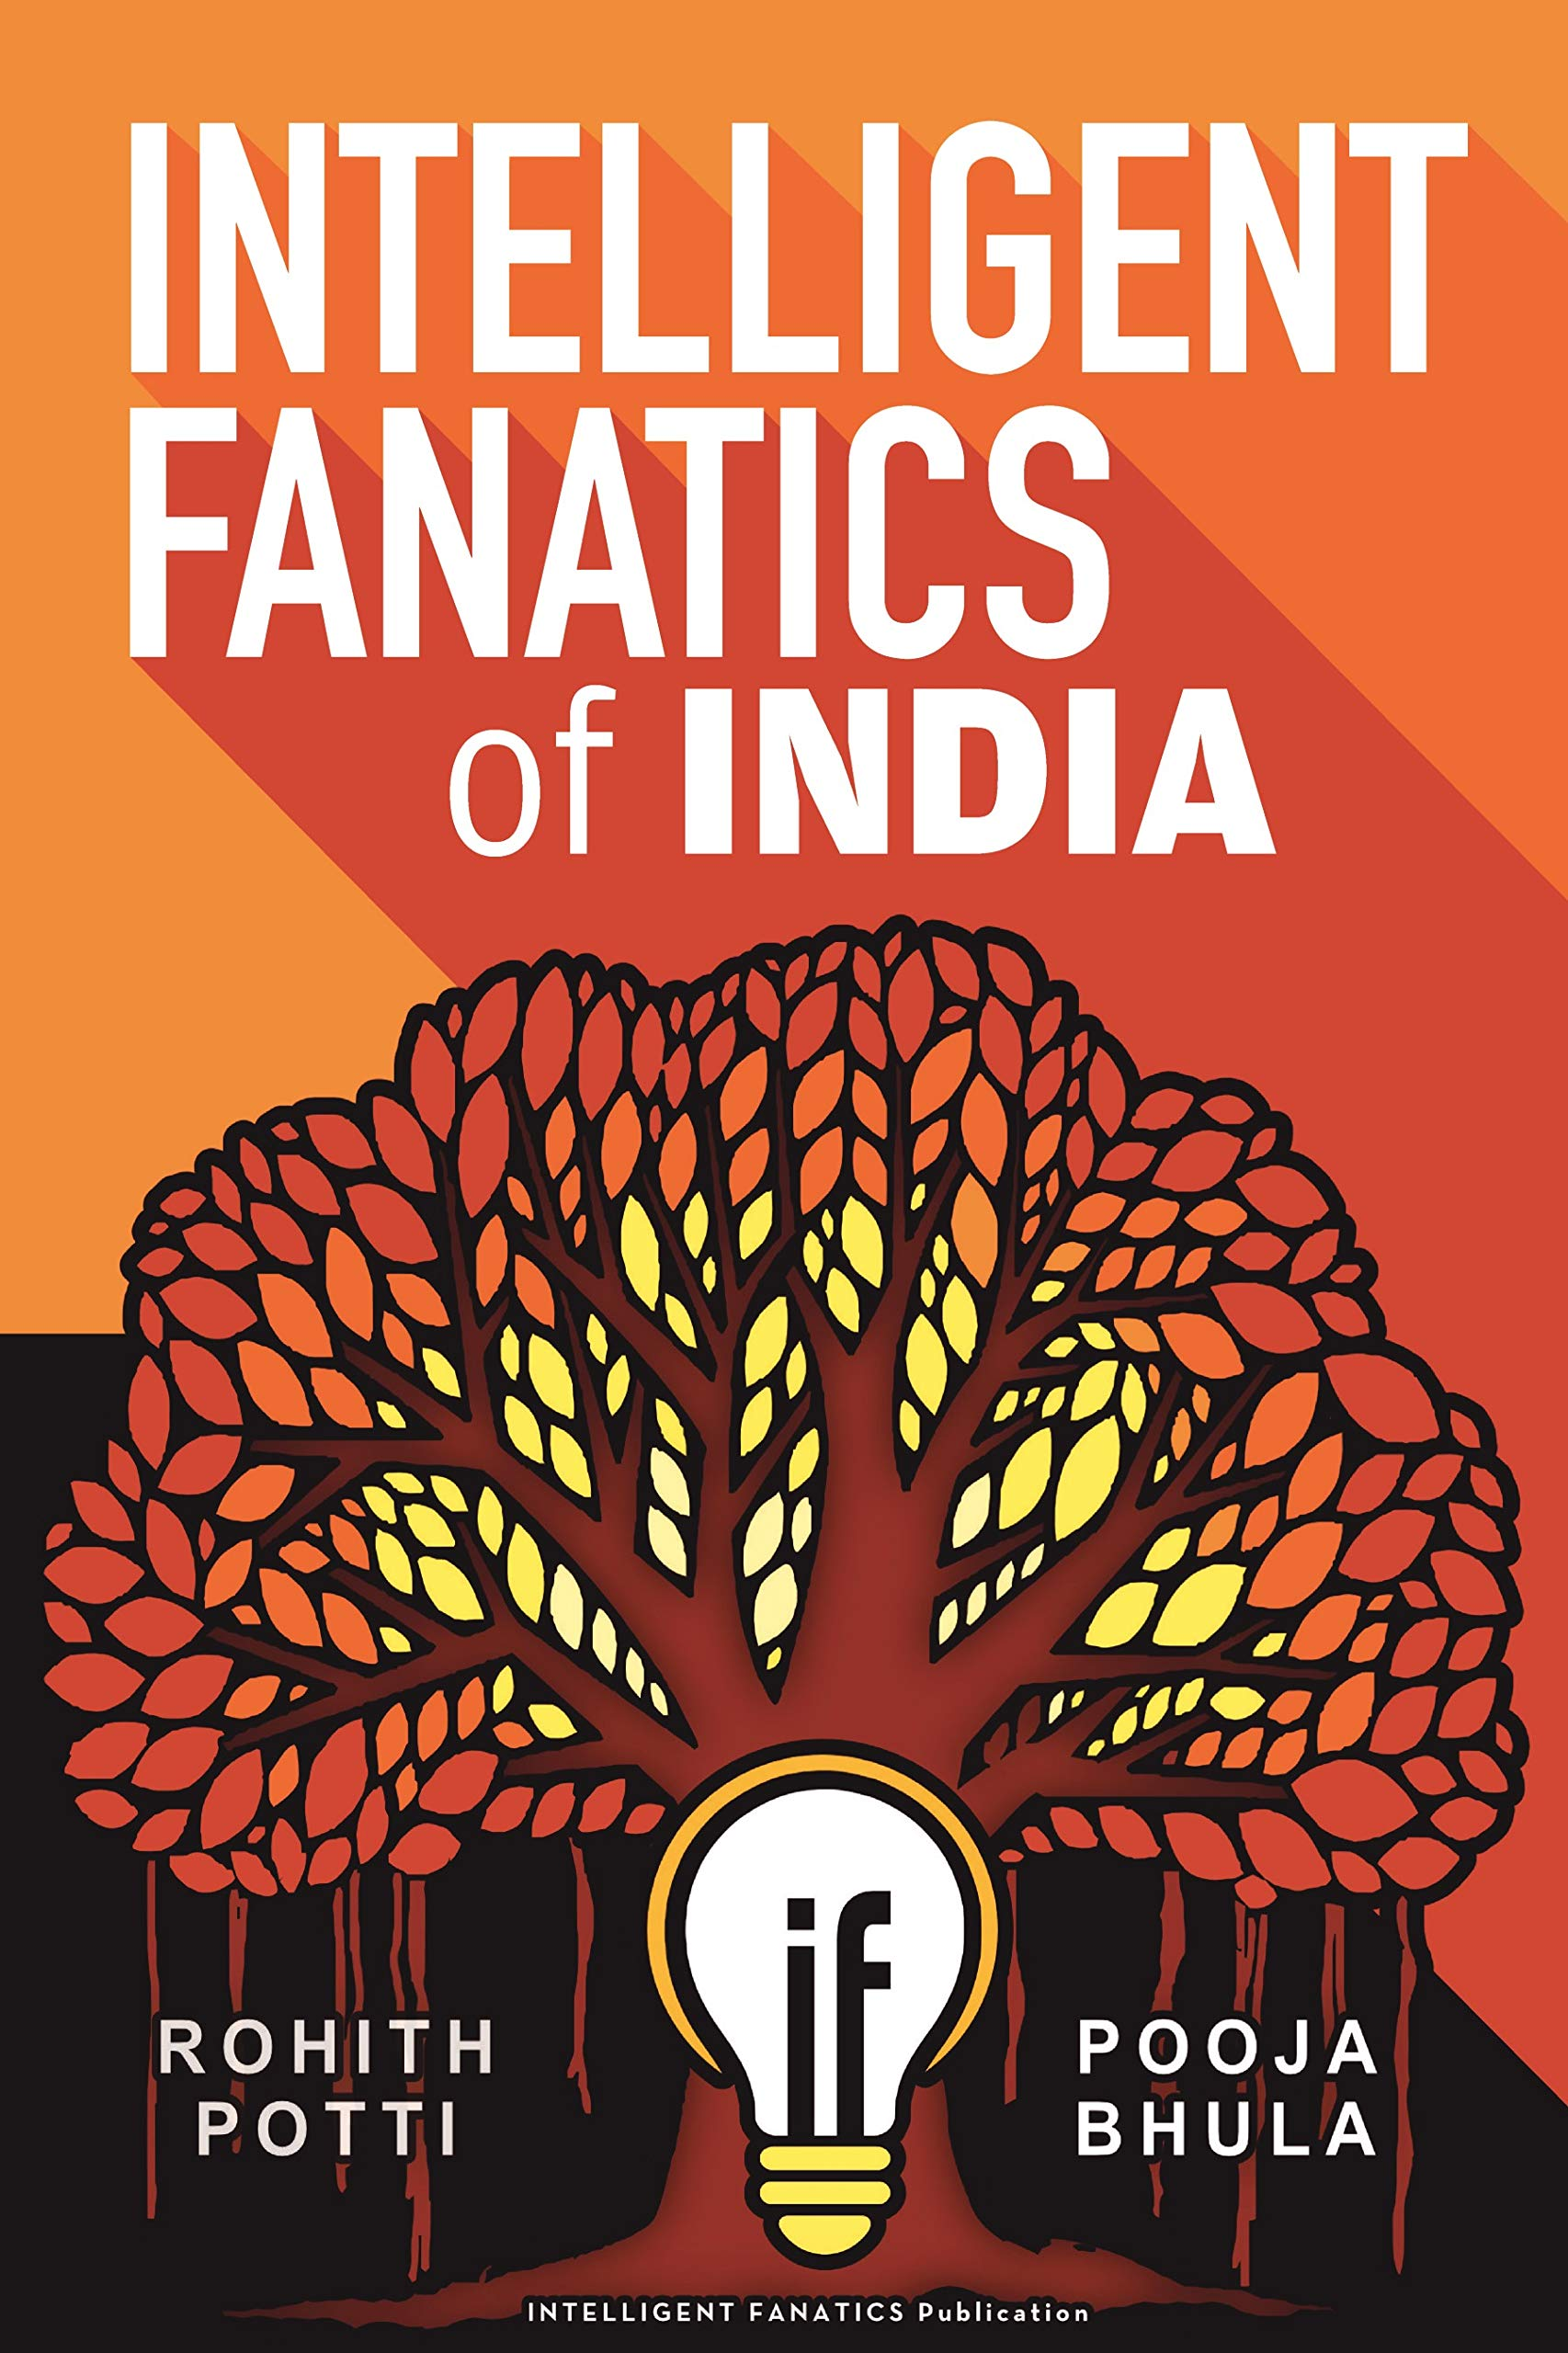 Intelligent Fanatics of India